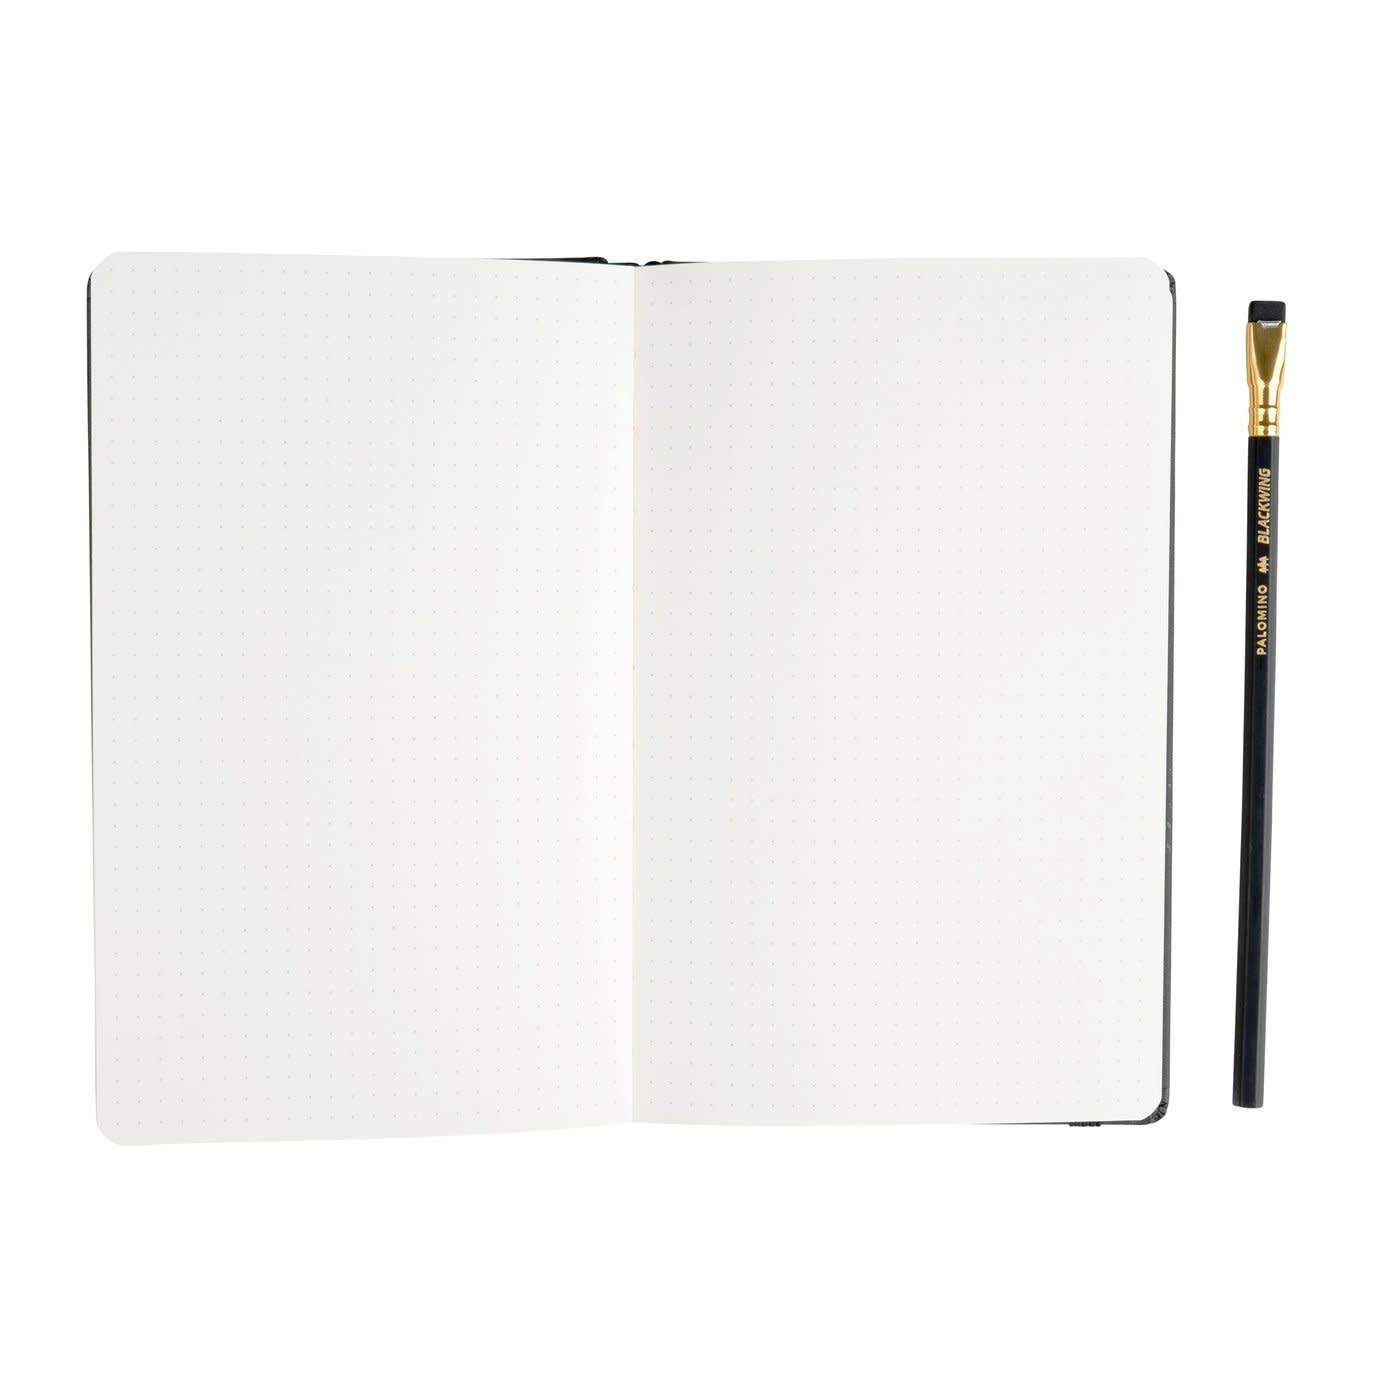 Blackwing Blackwing Slate Dot Grid Notebook